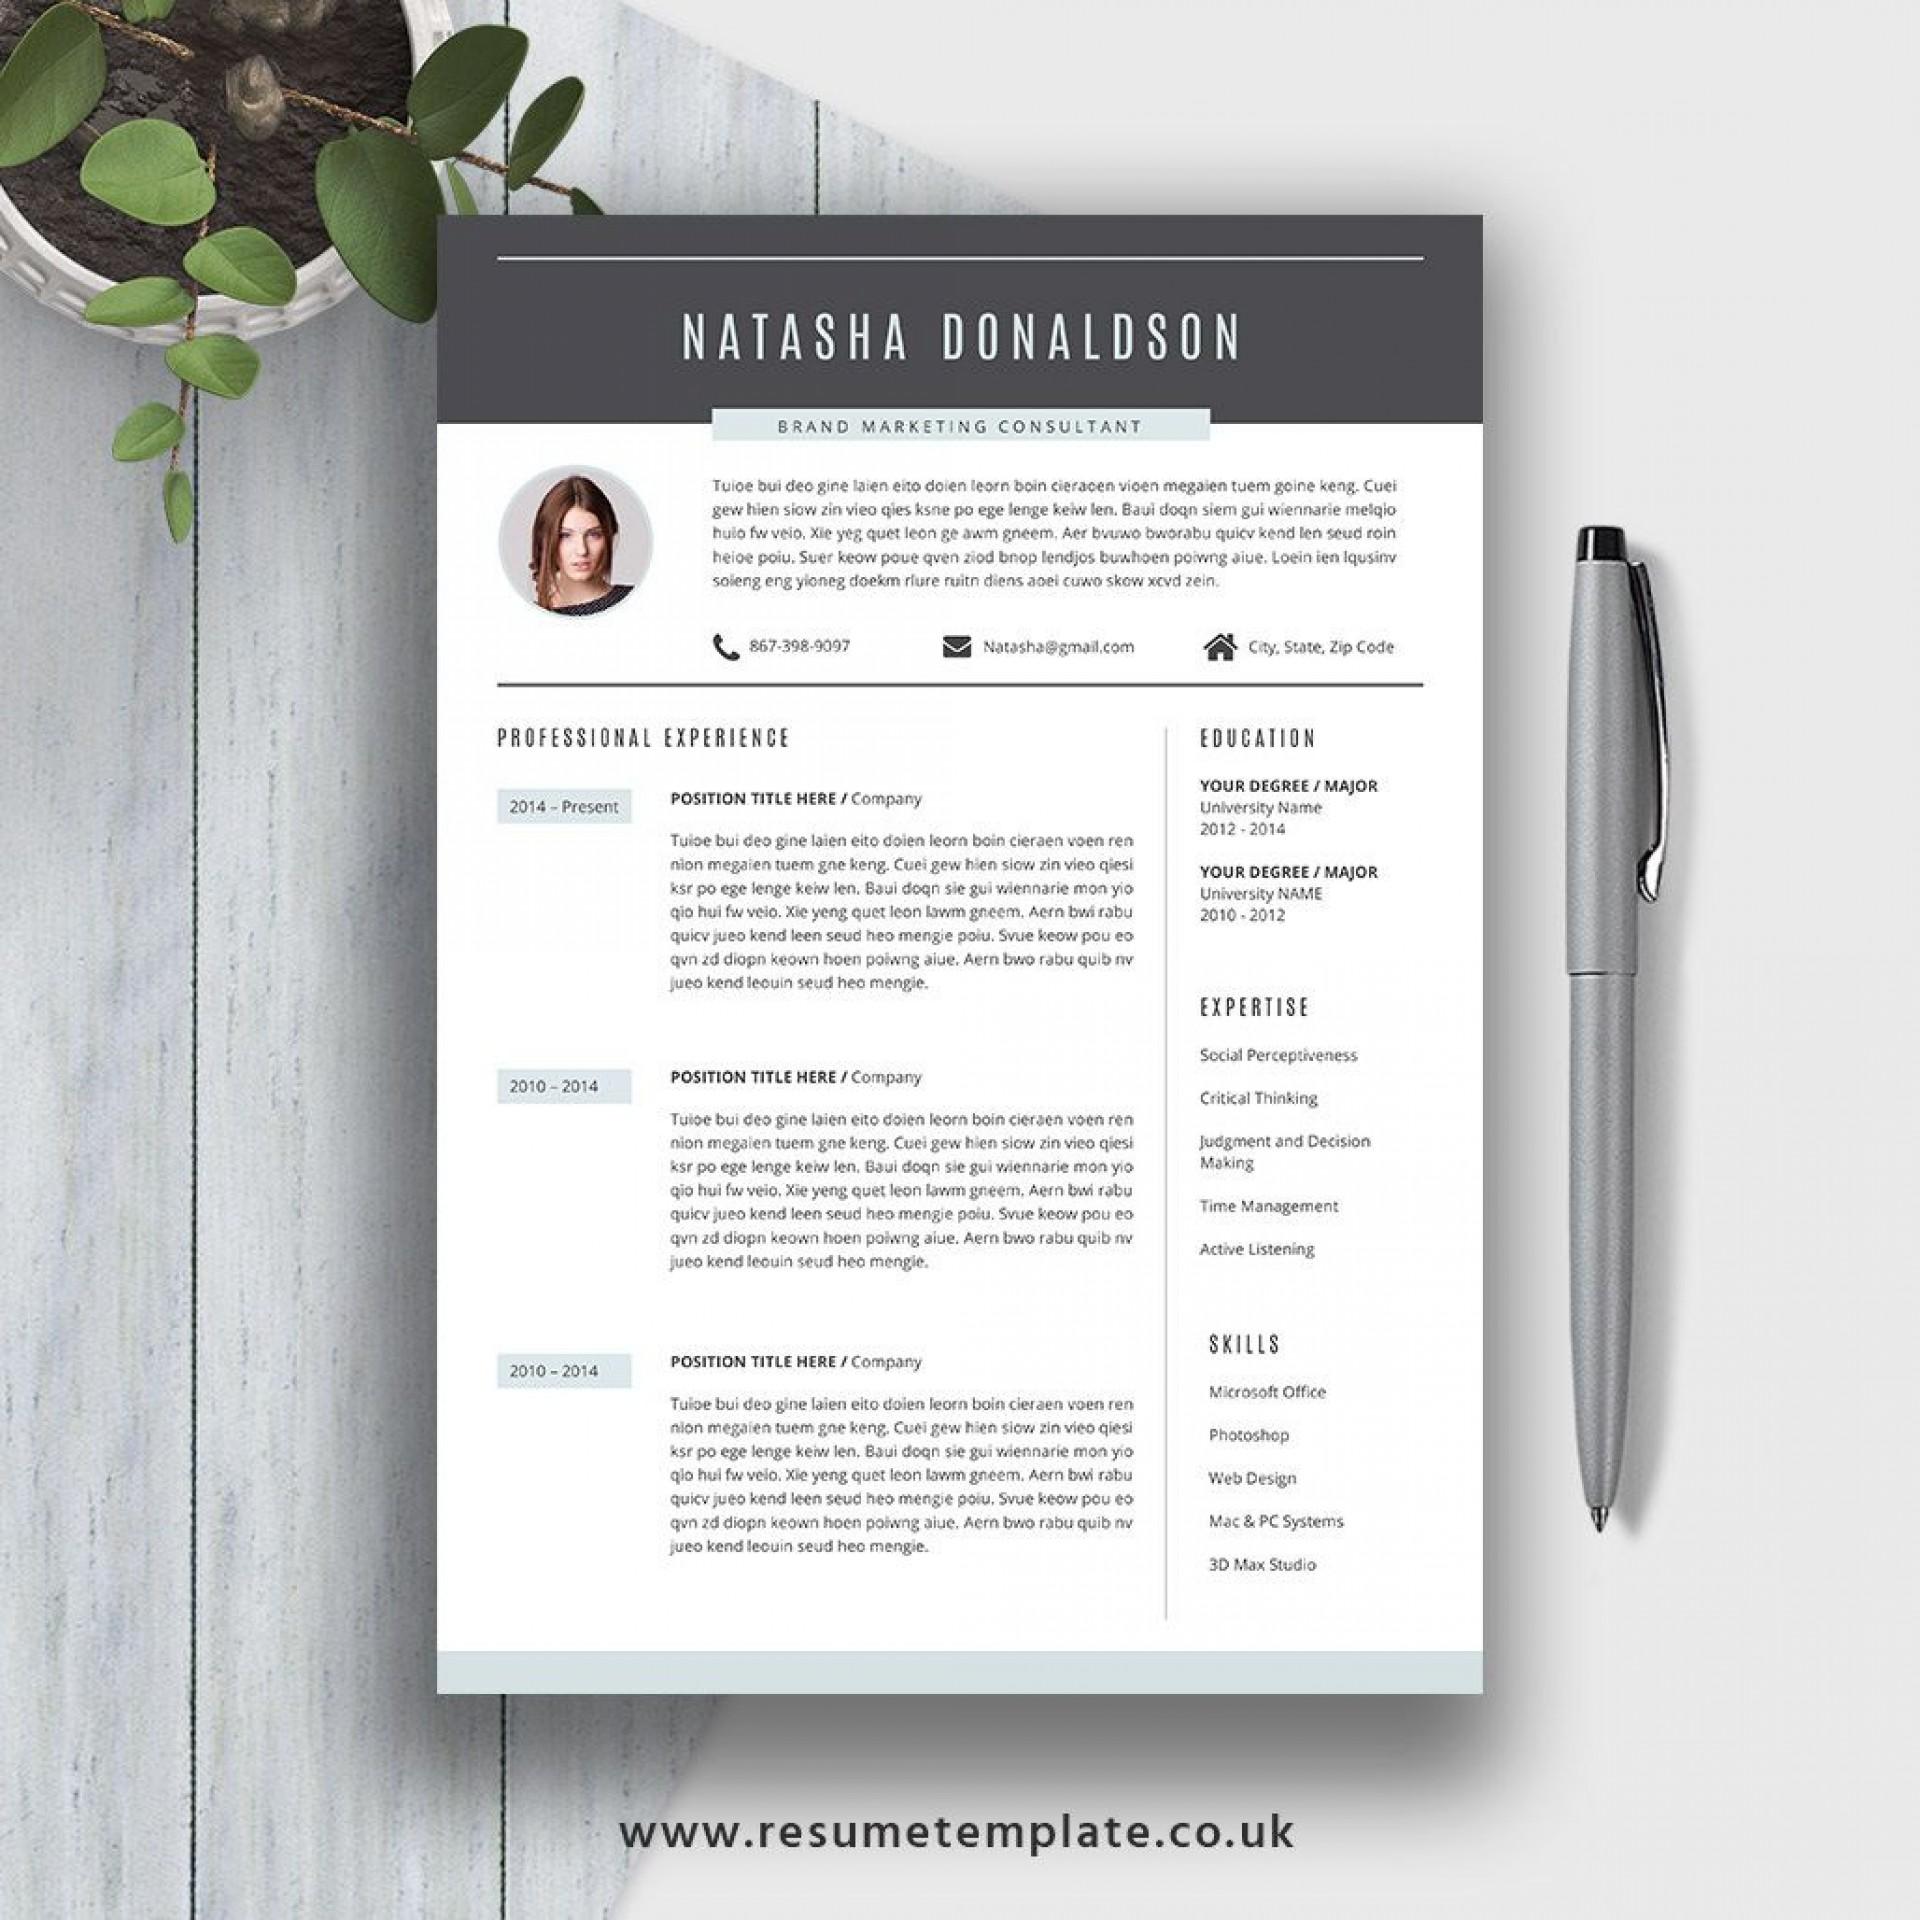 009 Impressive Best Professional Resume Template Photo  Reddit 2020 Download1920